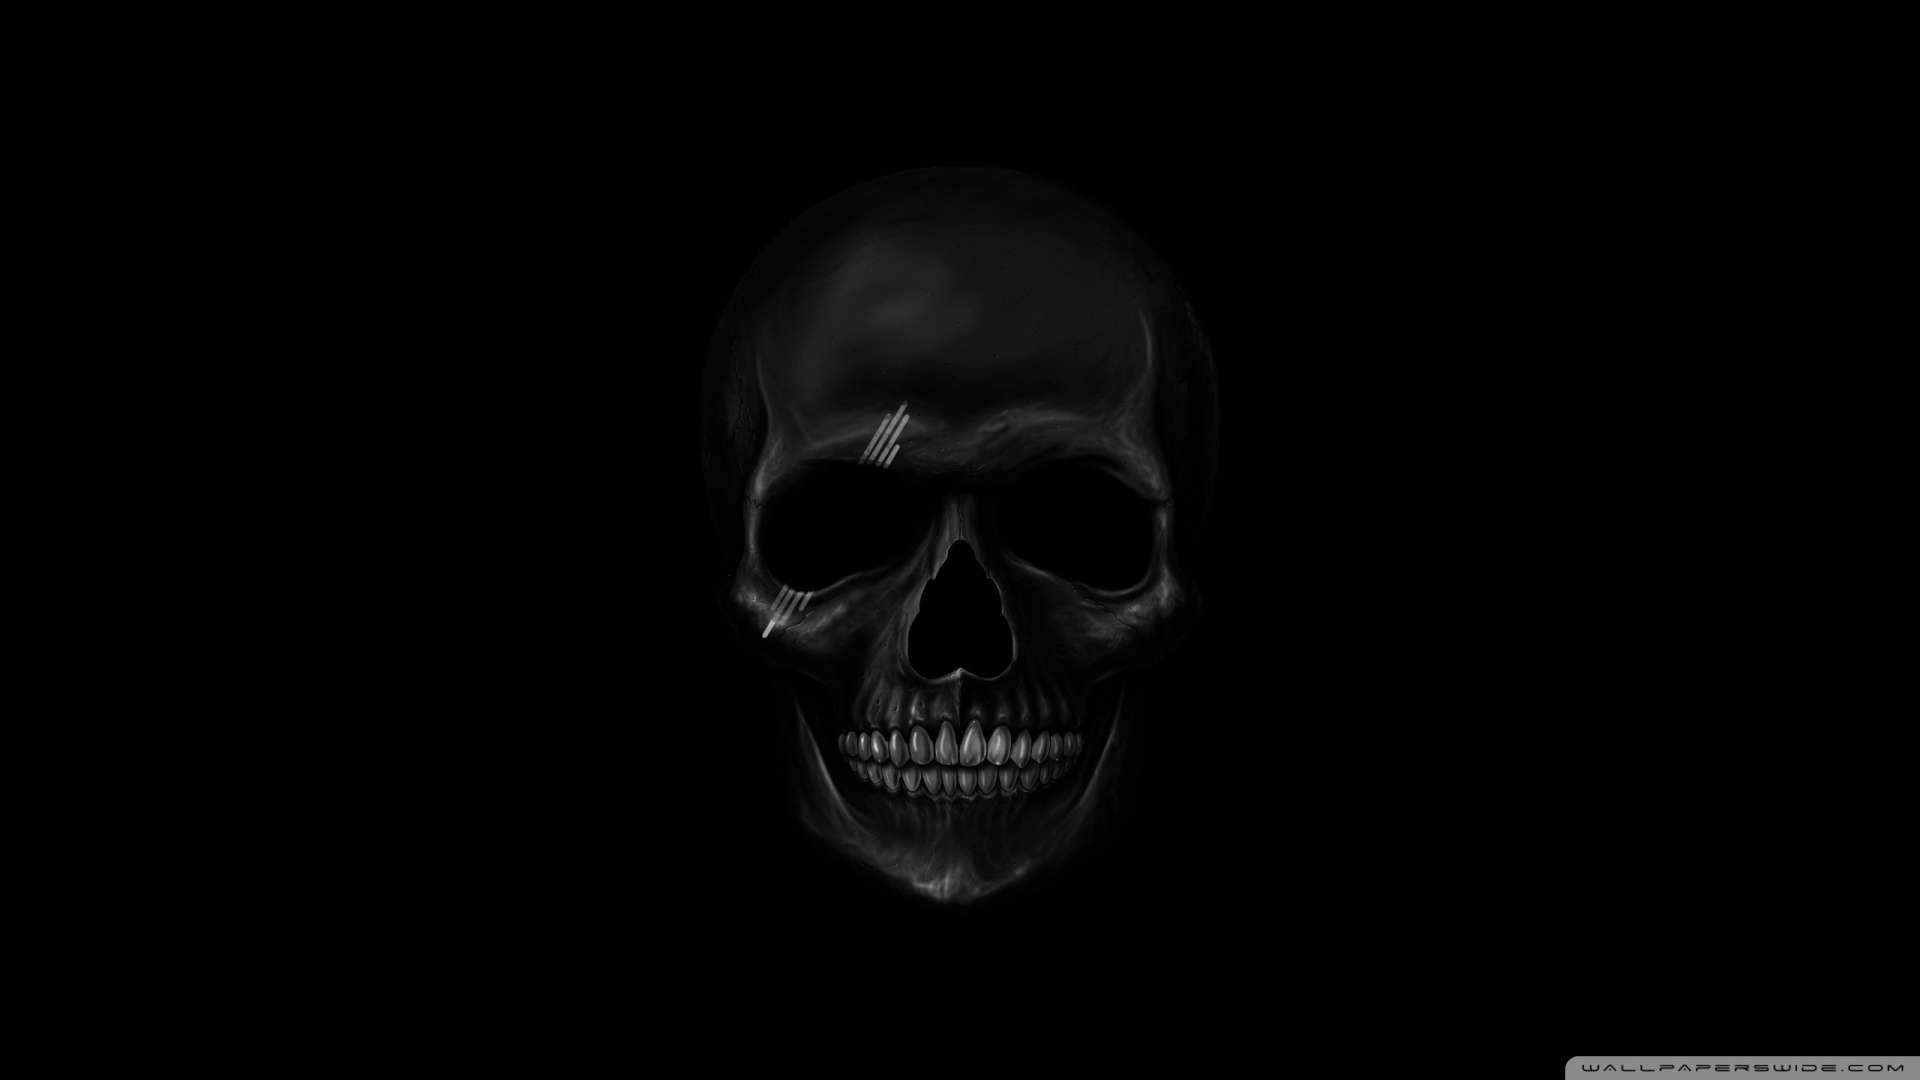 Wallpaper Black Skull Wallpaper 1080p HD Upload at February 12 2014 1920x1080